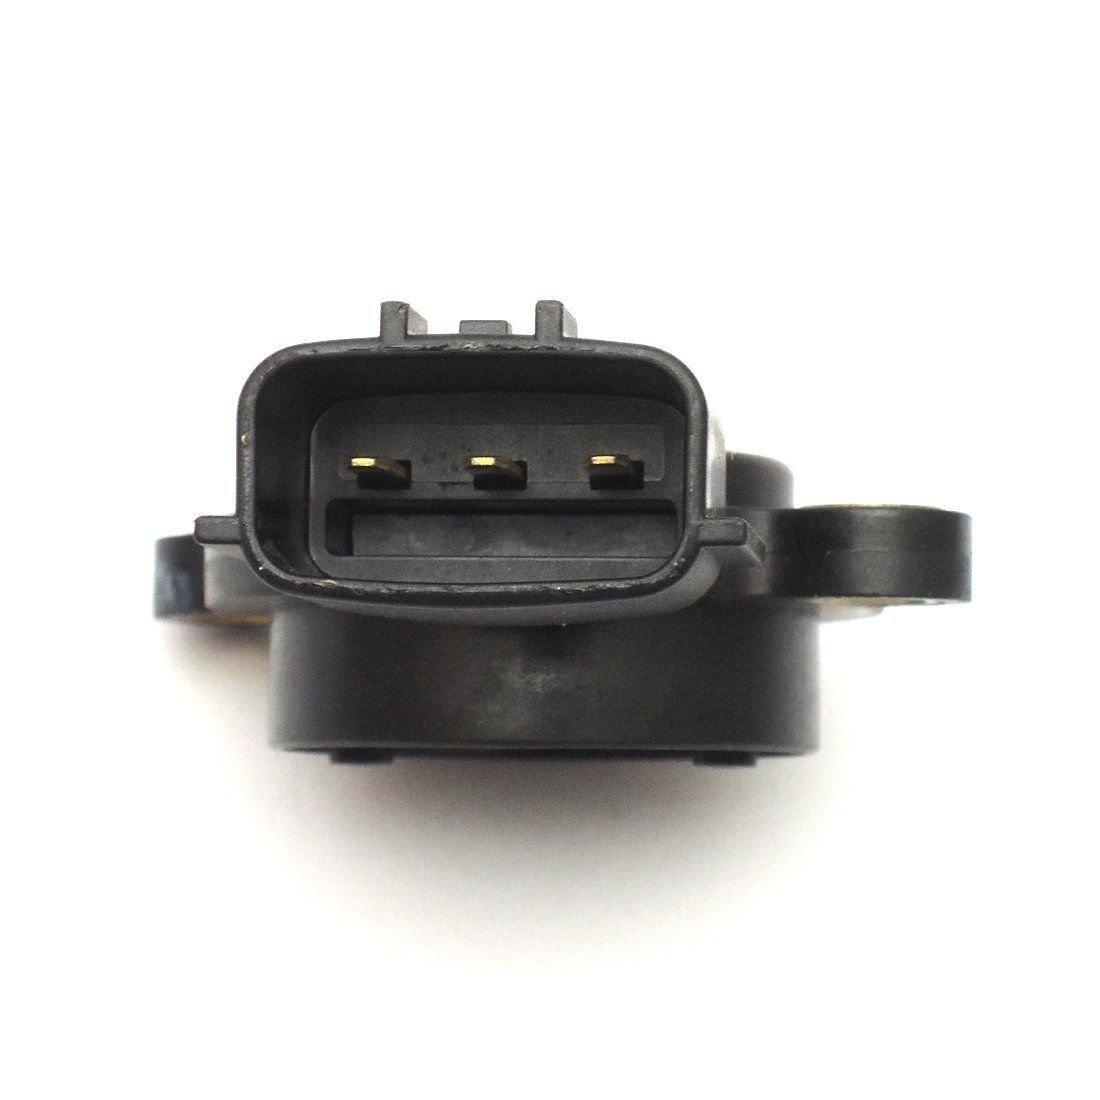 Shift Angle Sensor Fits For 2001 2014 Honda Foreman Rubicon 500 Fuel Filter Trx500fa 2004 2007 Rancher 400 Trx400fa 06380 Hn2 305 Automotive